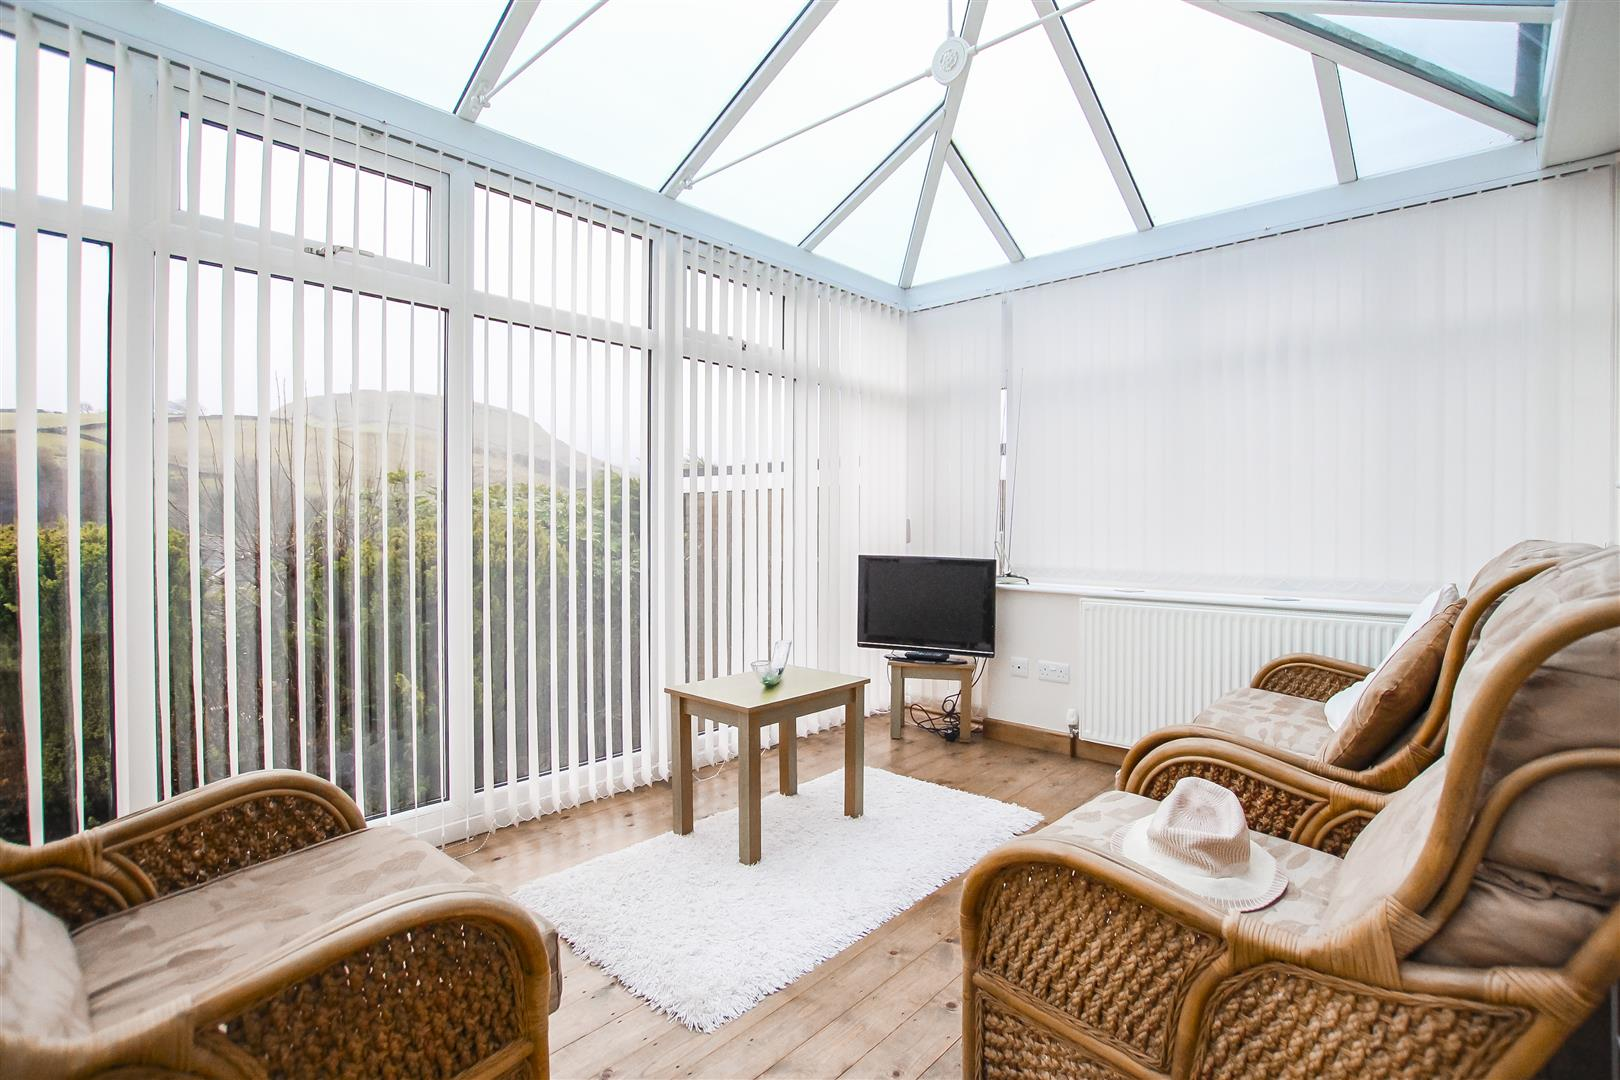 3 Bedroom Detached Bungalow For Sale - Conservatory